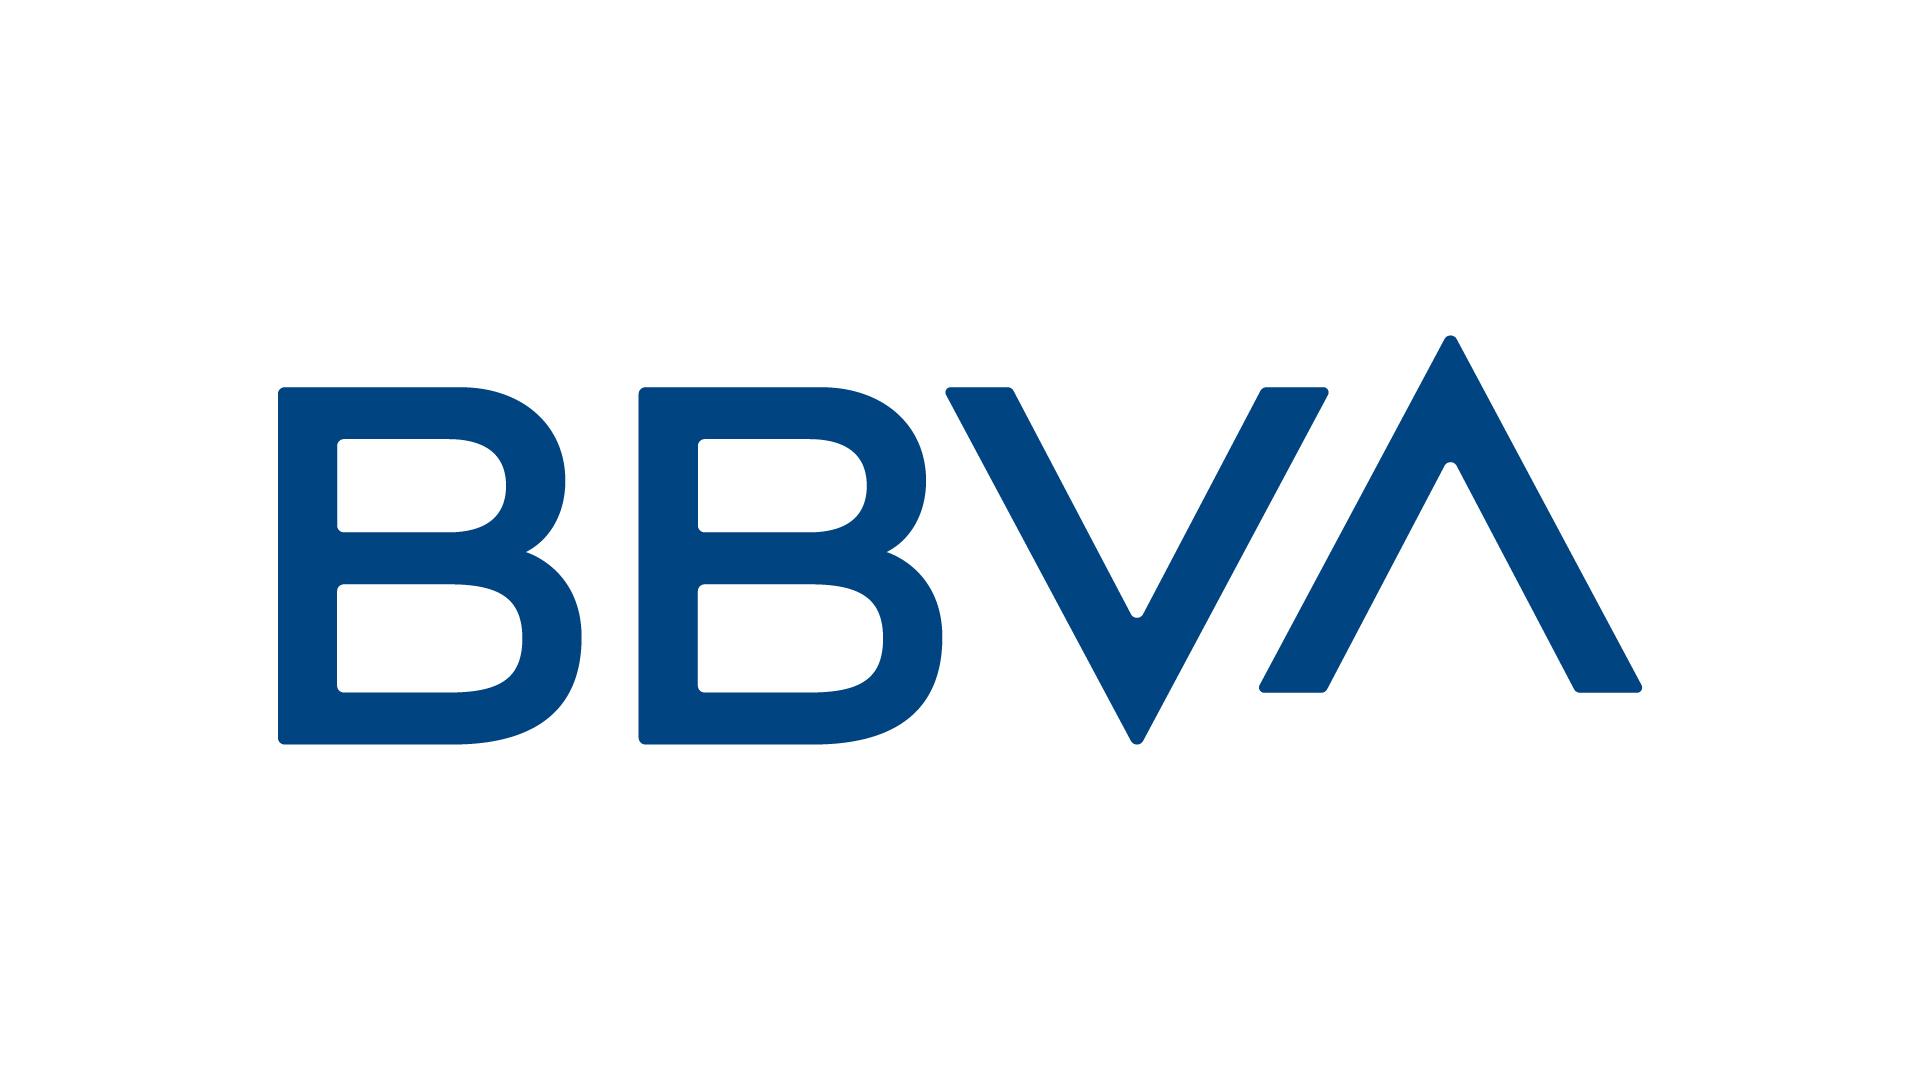 https://www.ingeser.es/wp-content/uploads/2021/03/BBVA.jpg